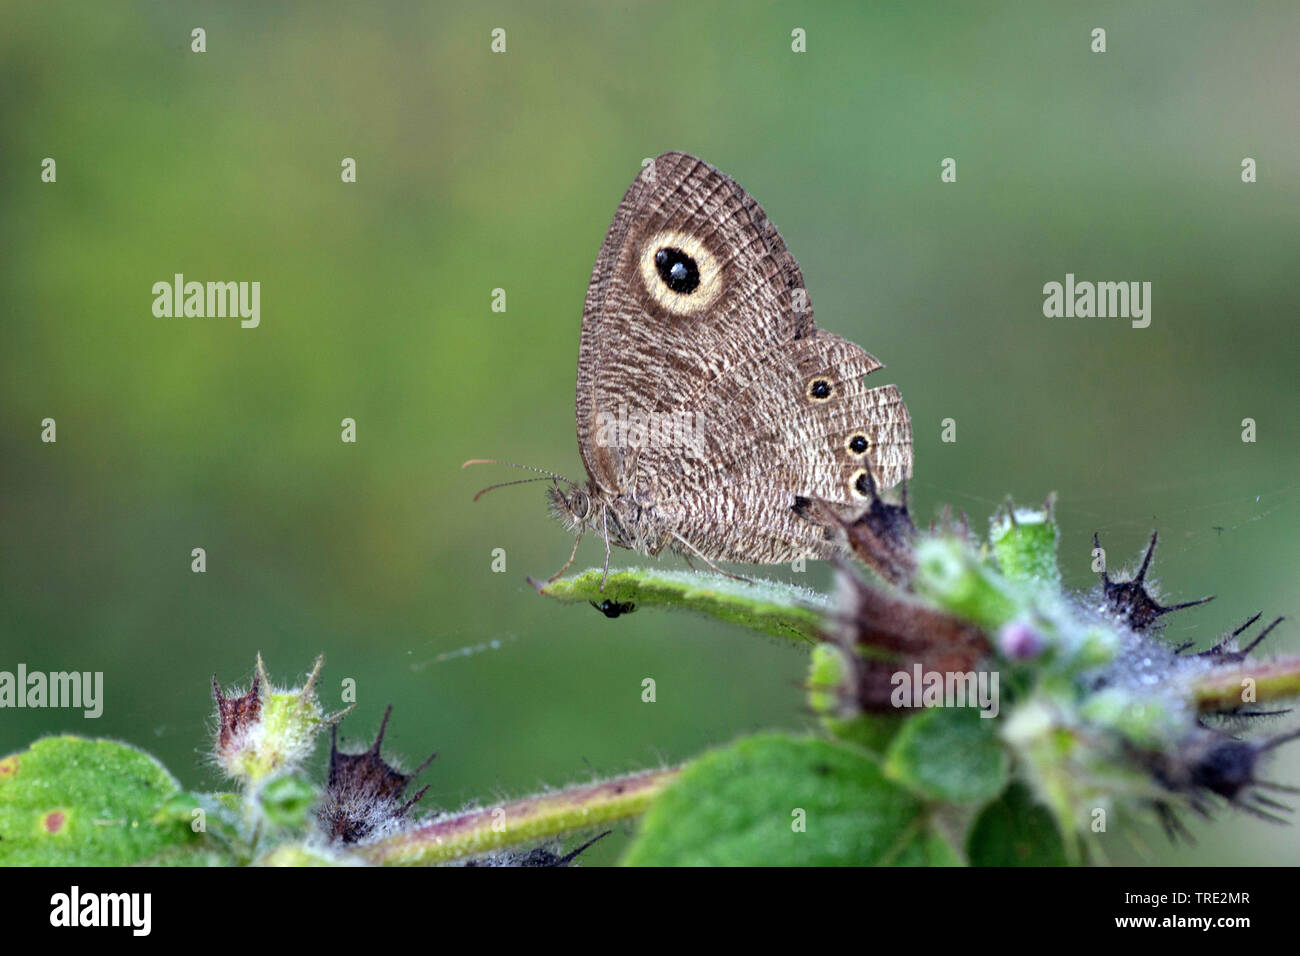 Edelfalter, Ypthima (Ypthima spec.), Seitenansicht, Gambia, Western Division WD | Ypthima (Ypthima spec.), lateral view, Gambia, Western Division WD | - Stock Image